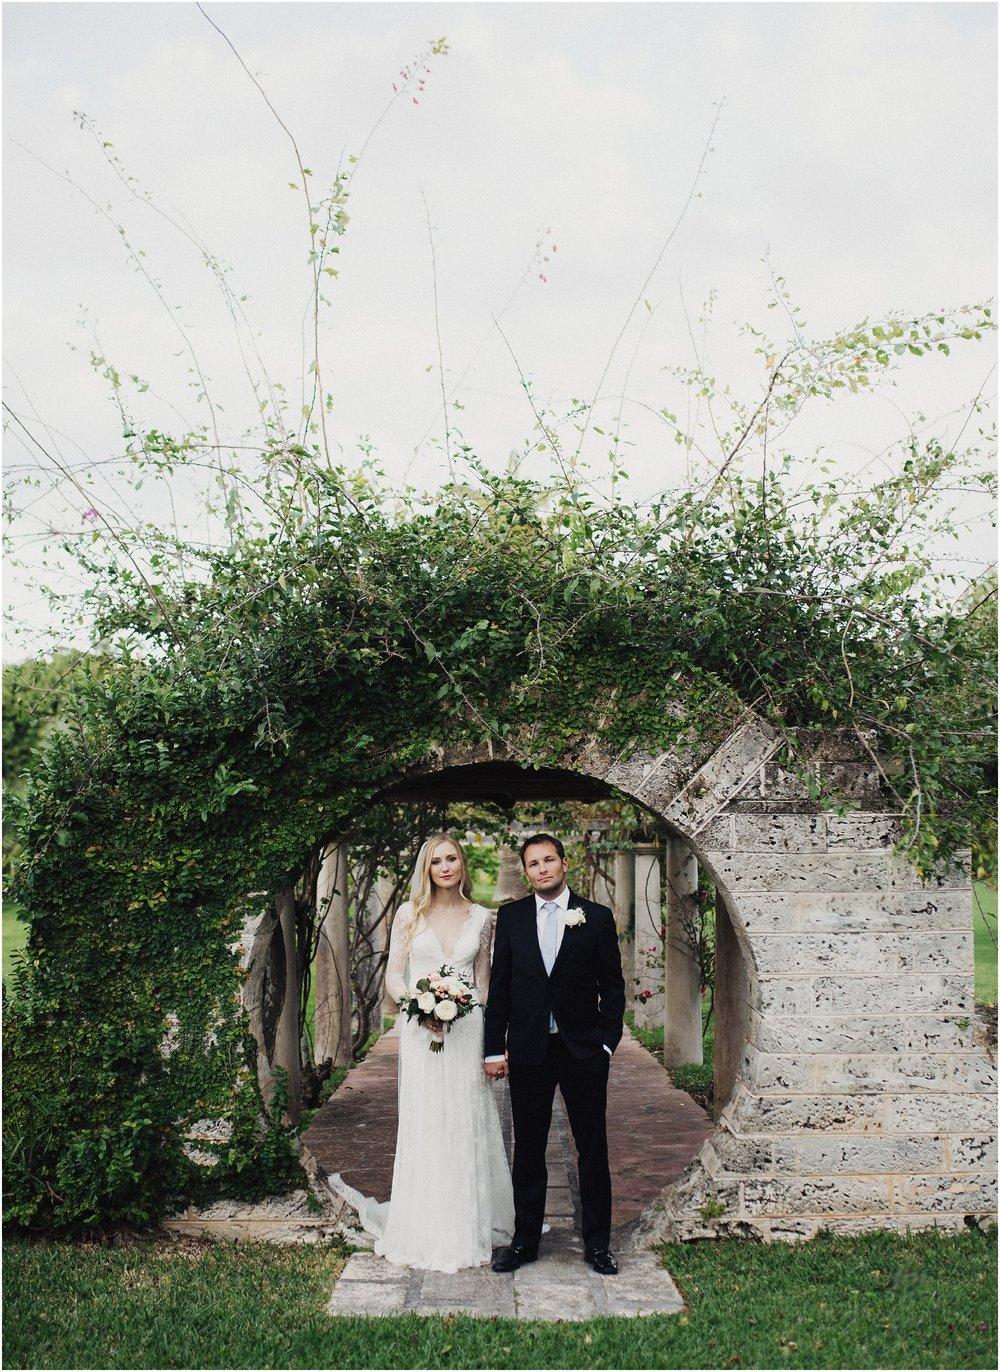 Honeymoon Arch Wedding Photo